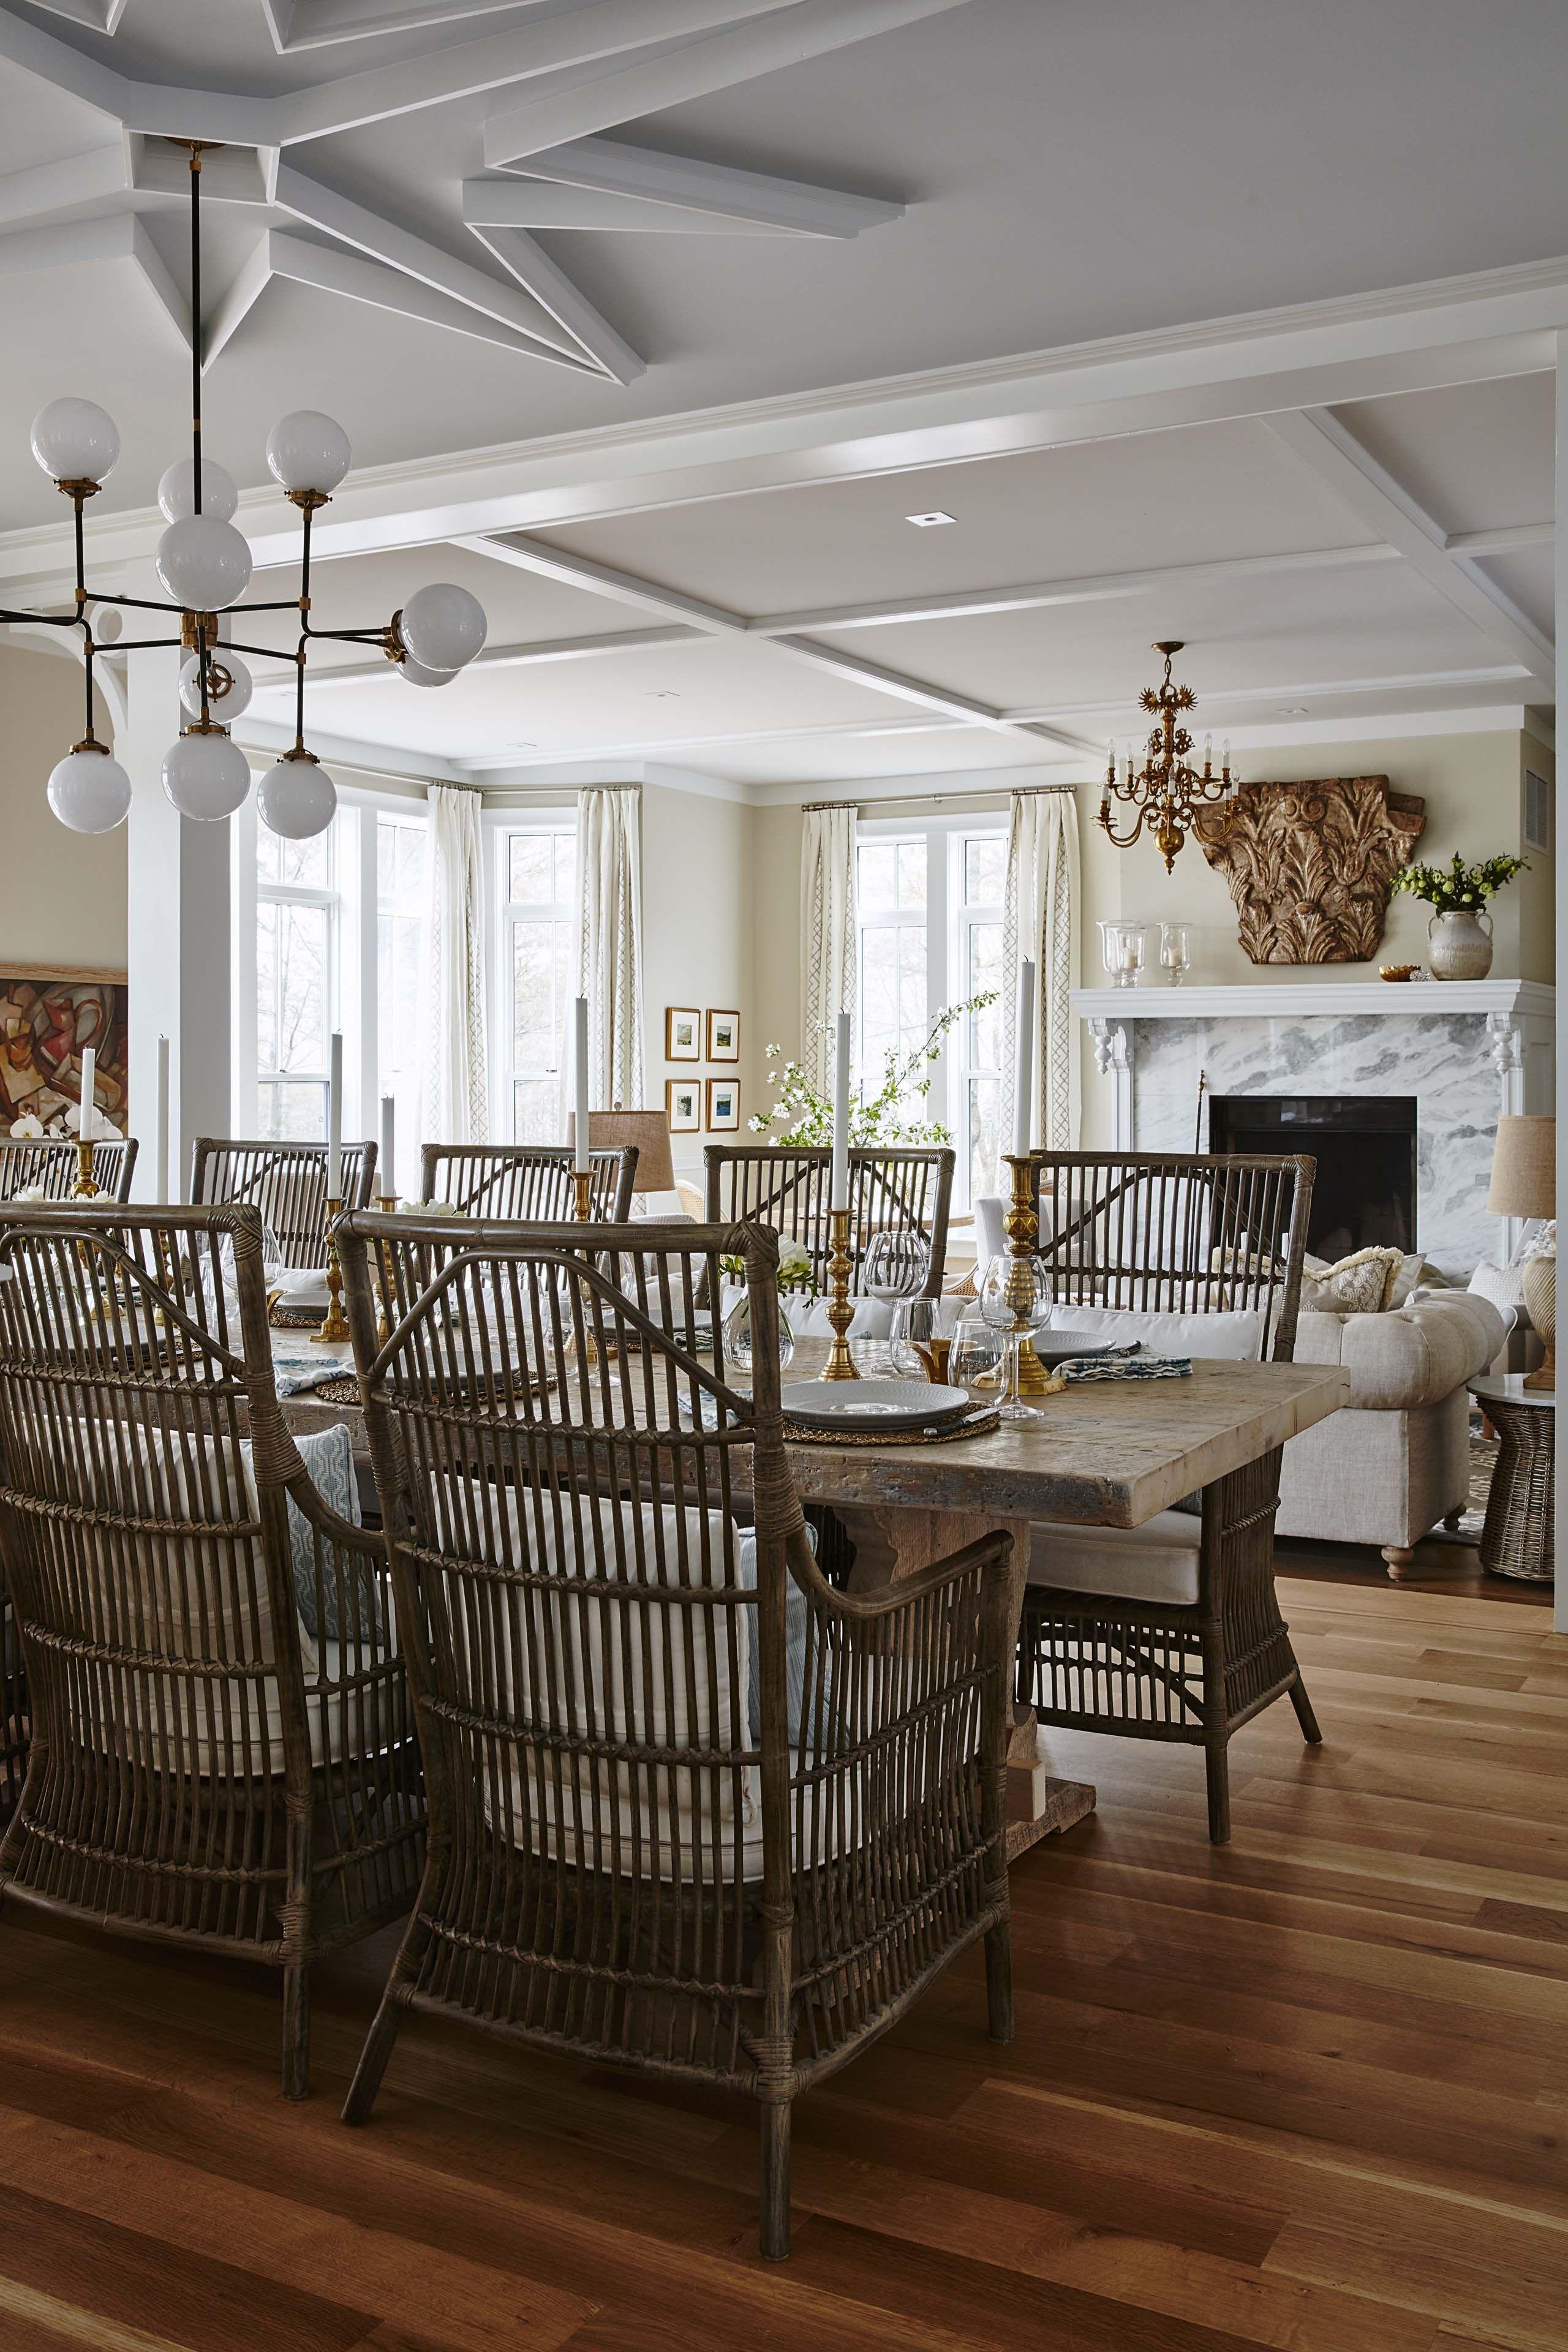 Farmhouse Dining Table And Chairs Open To Living Room. #SarahRichardson  #modernfarmhouse #ceilingdesign